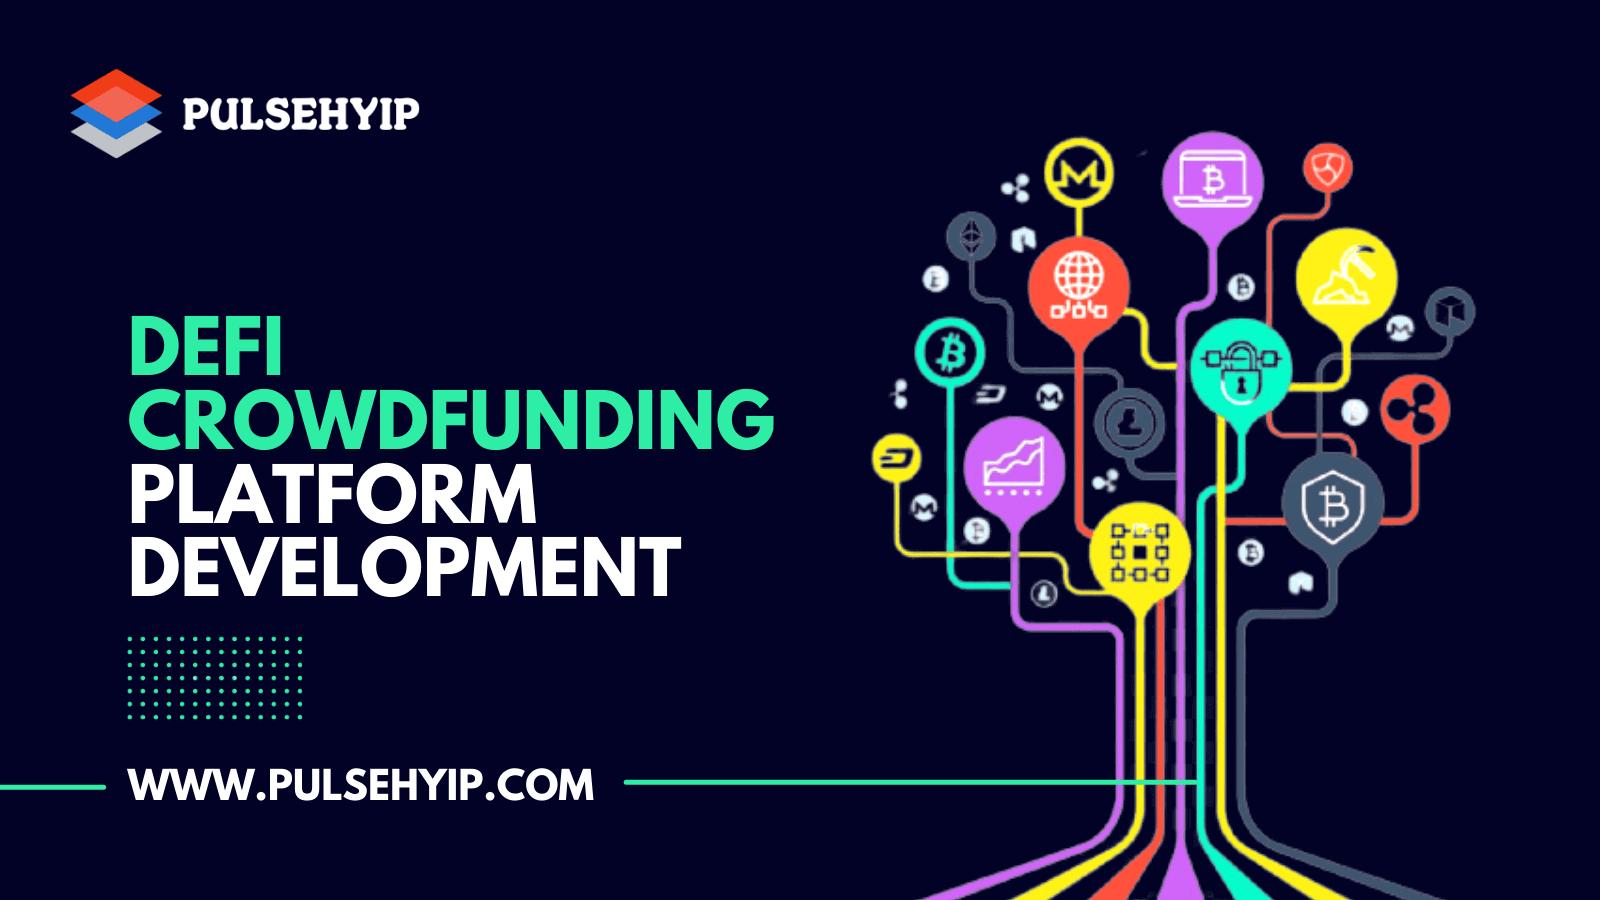 DeFi Crowdfunding Platform Development Services to Reshape CrowdFunding